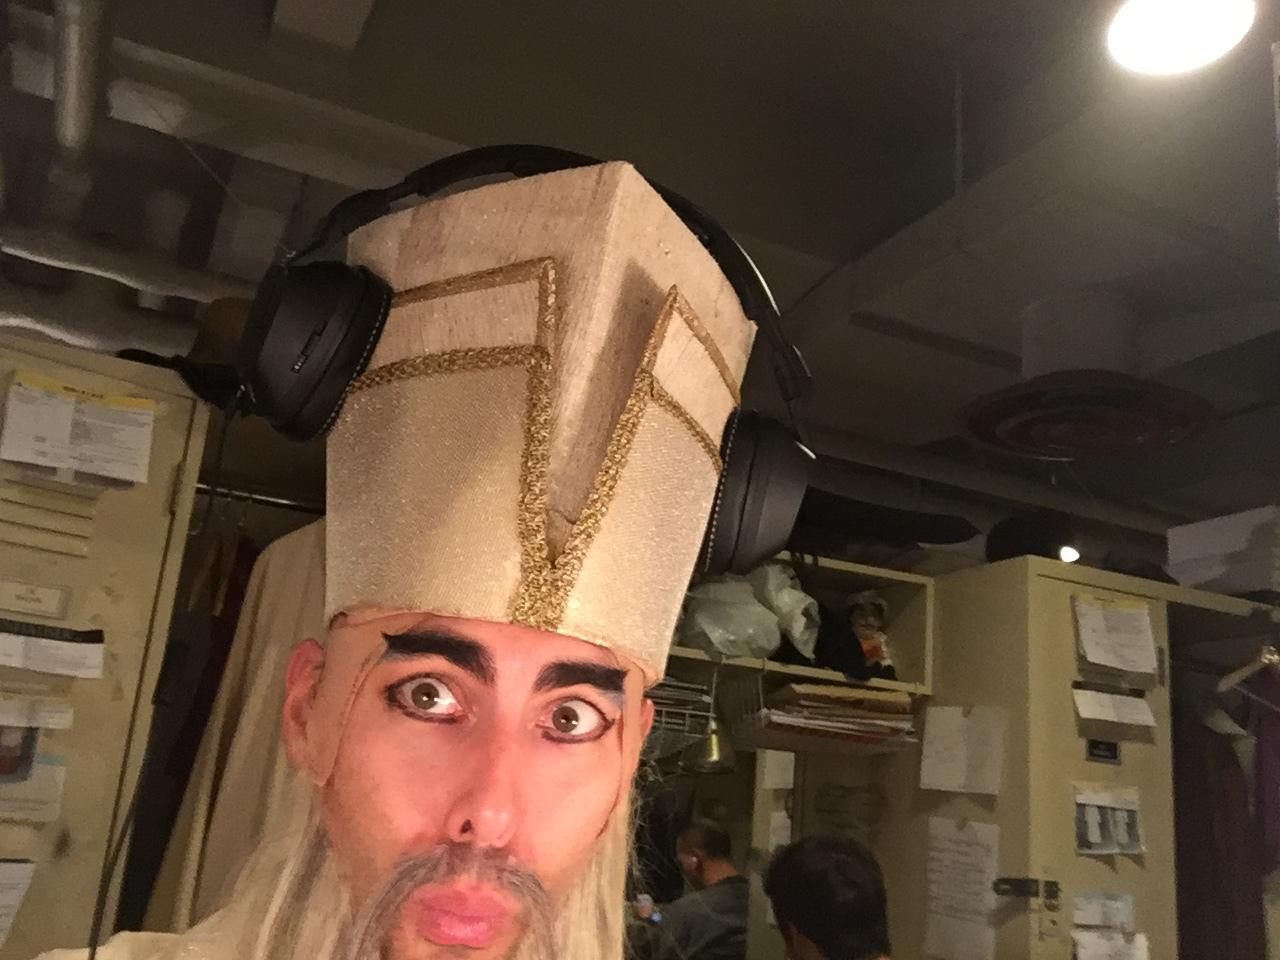 Turandot_Mayberry_headphones.JPG